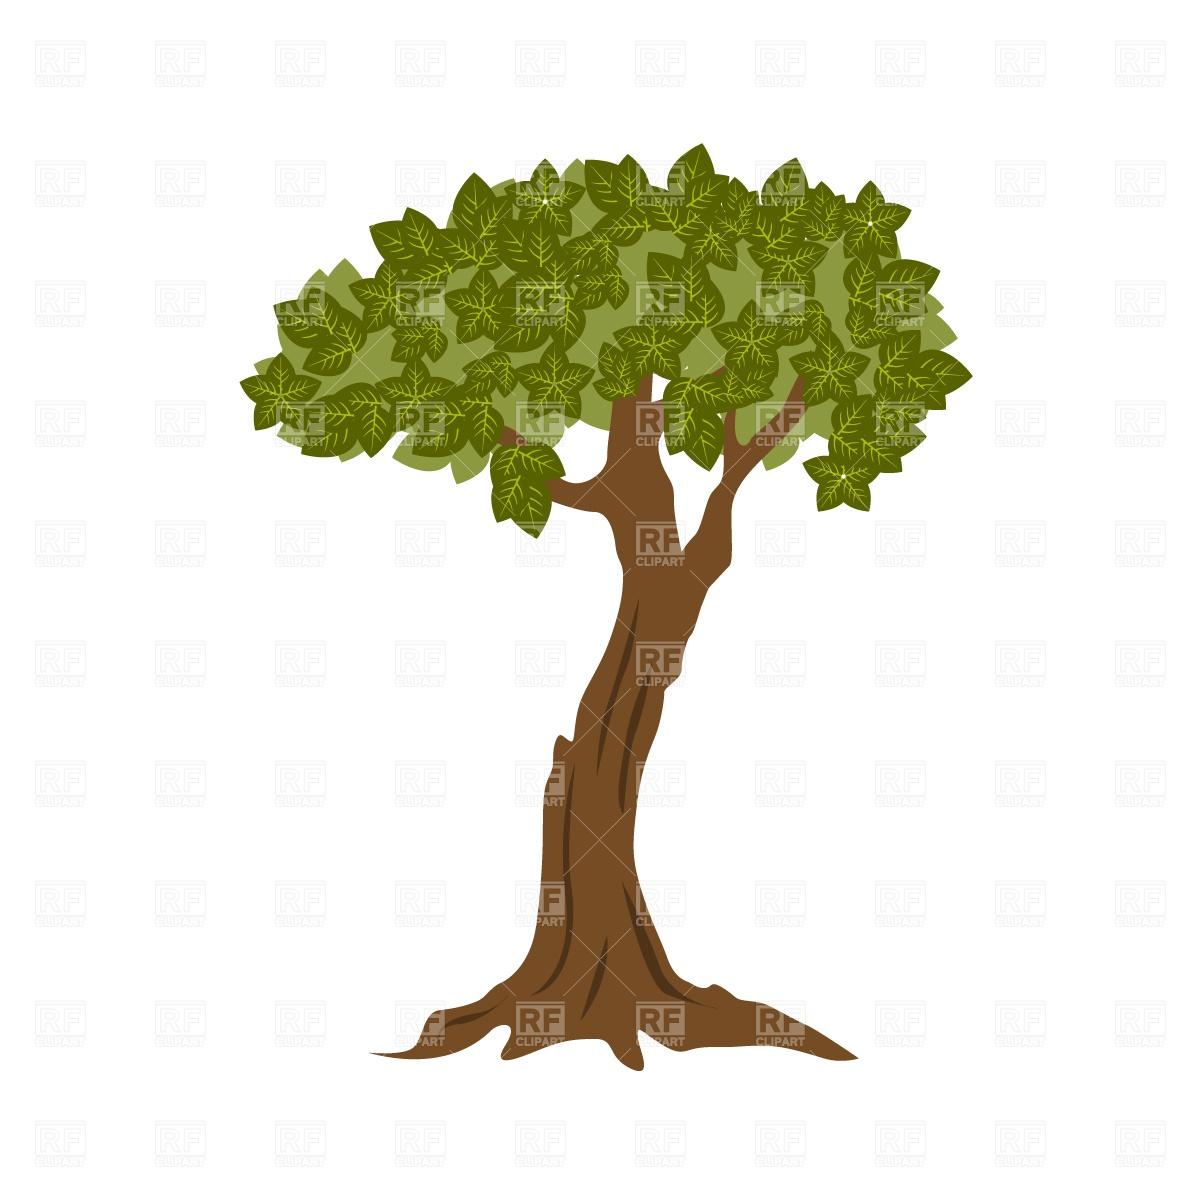 dead tree silhouette clip art at getdrawings com free for personal rh getdrawings com clip art of trees with branches clip art of trees with leaves